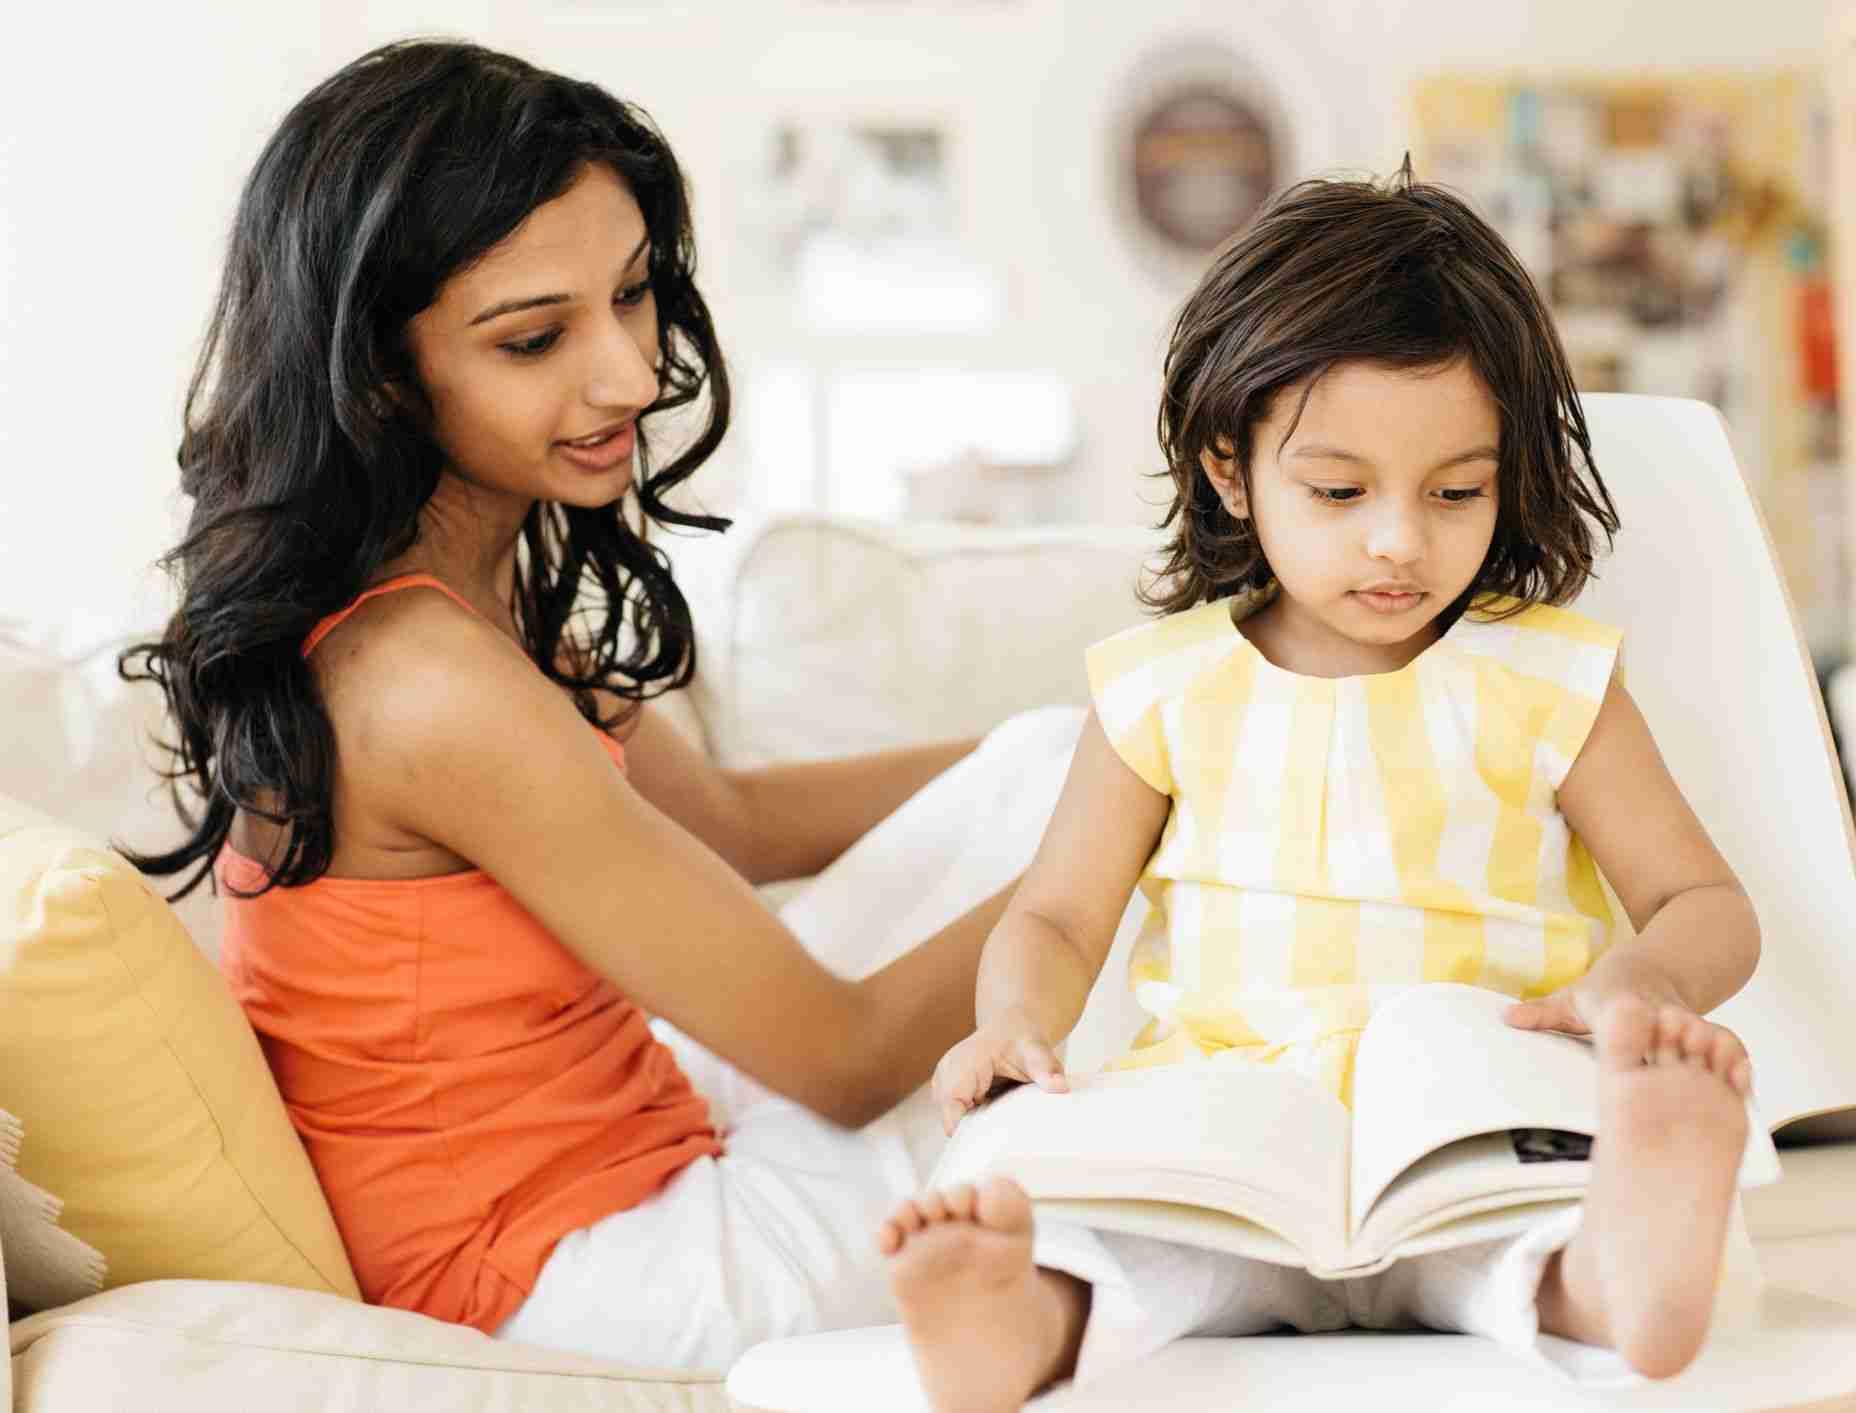 language of schooling for children